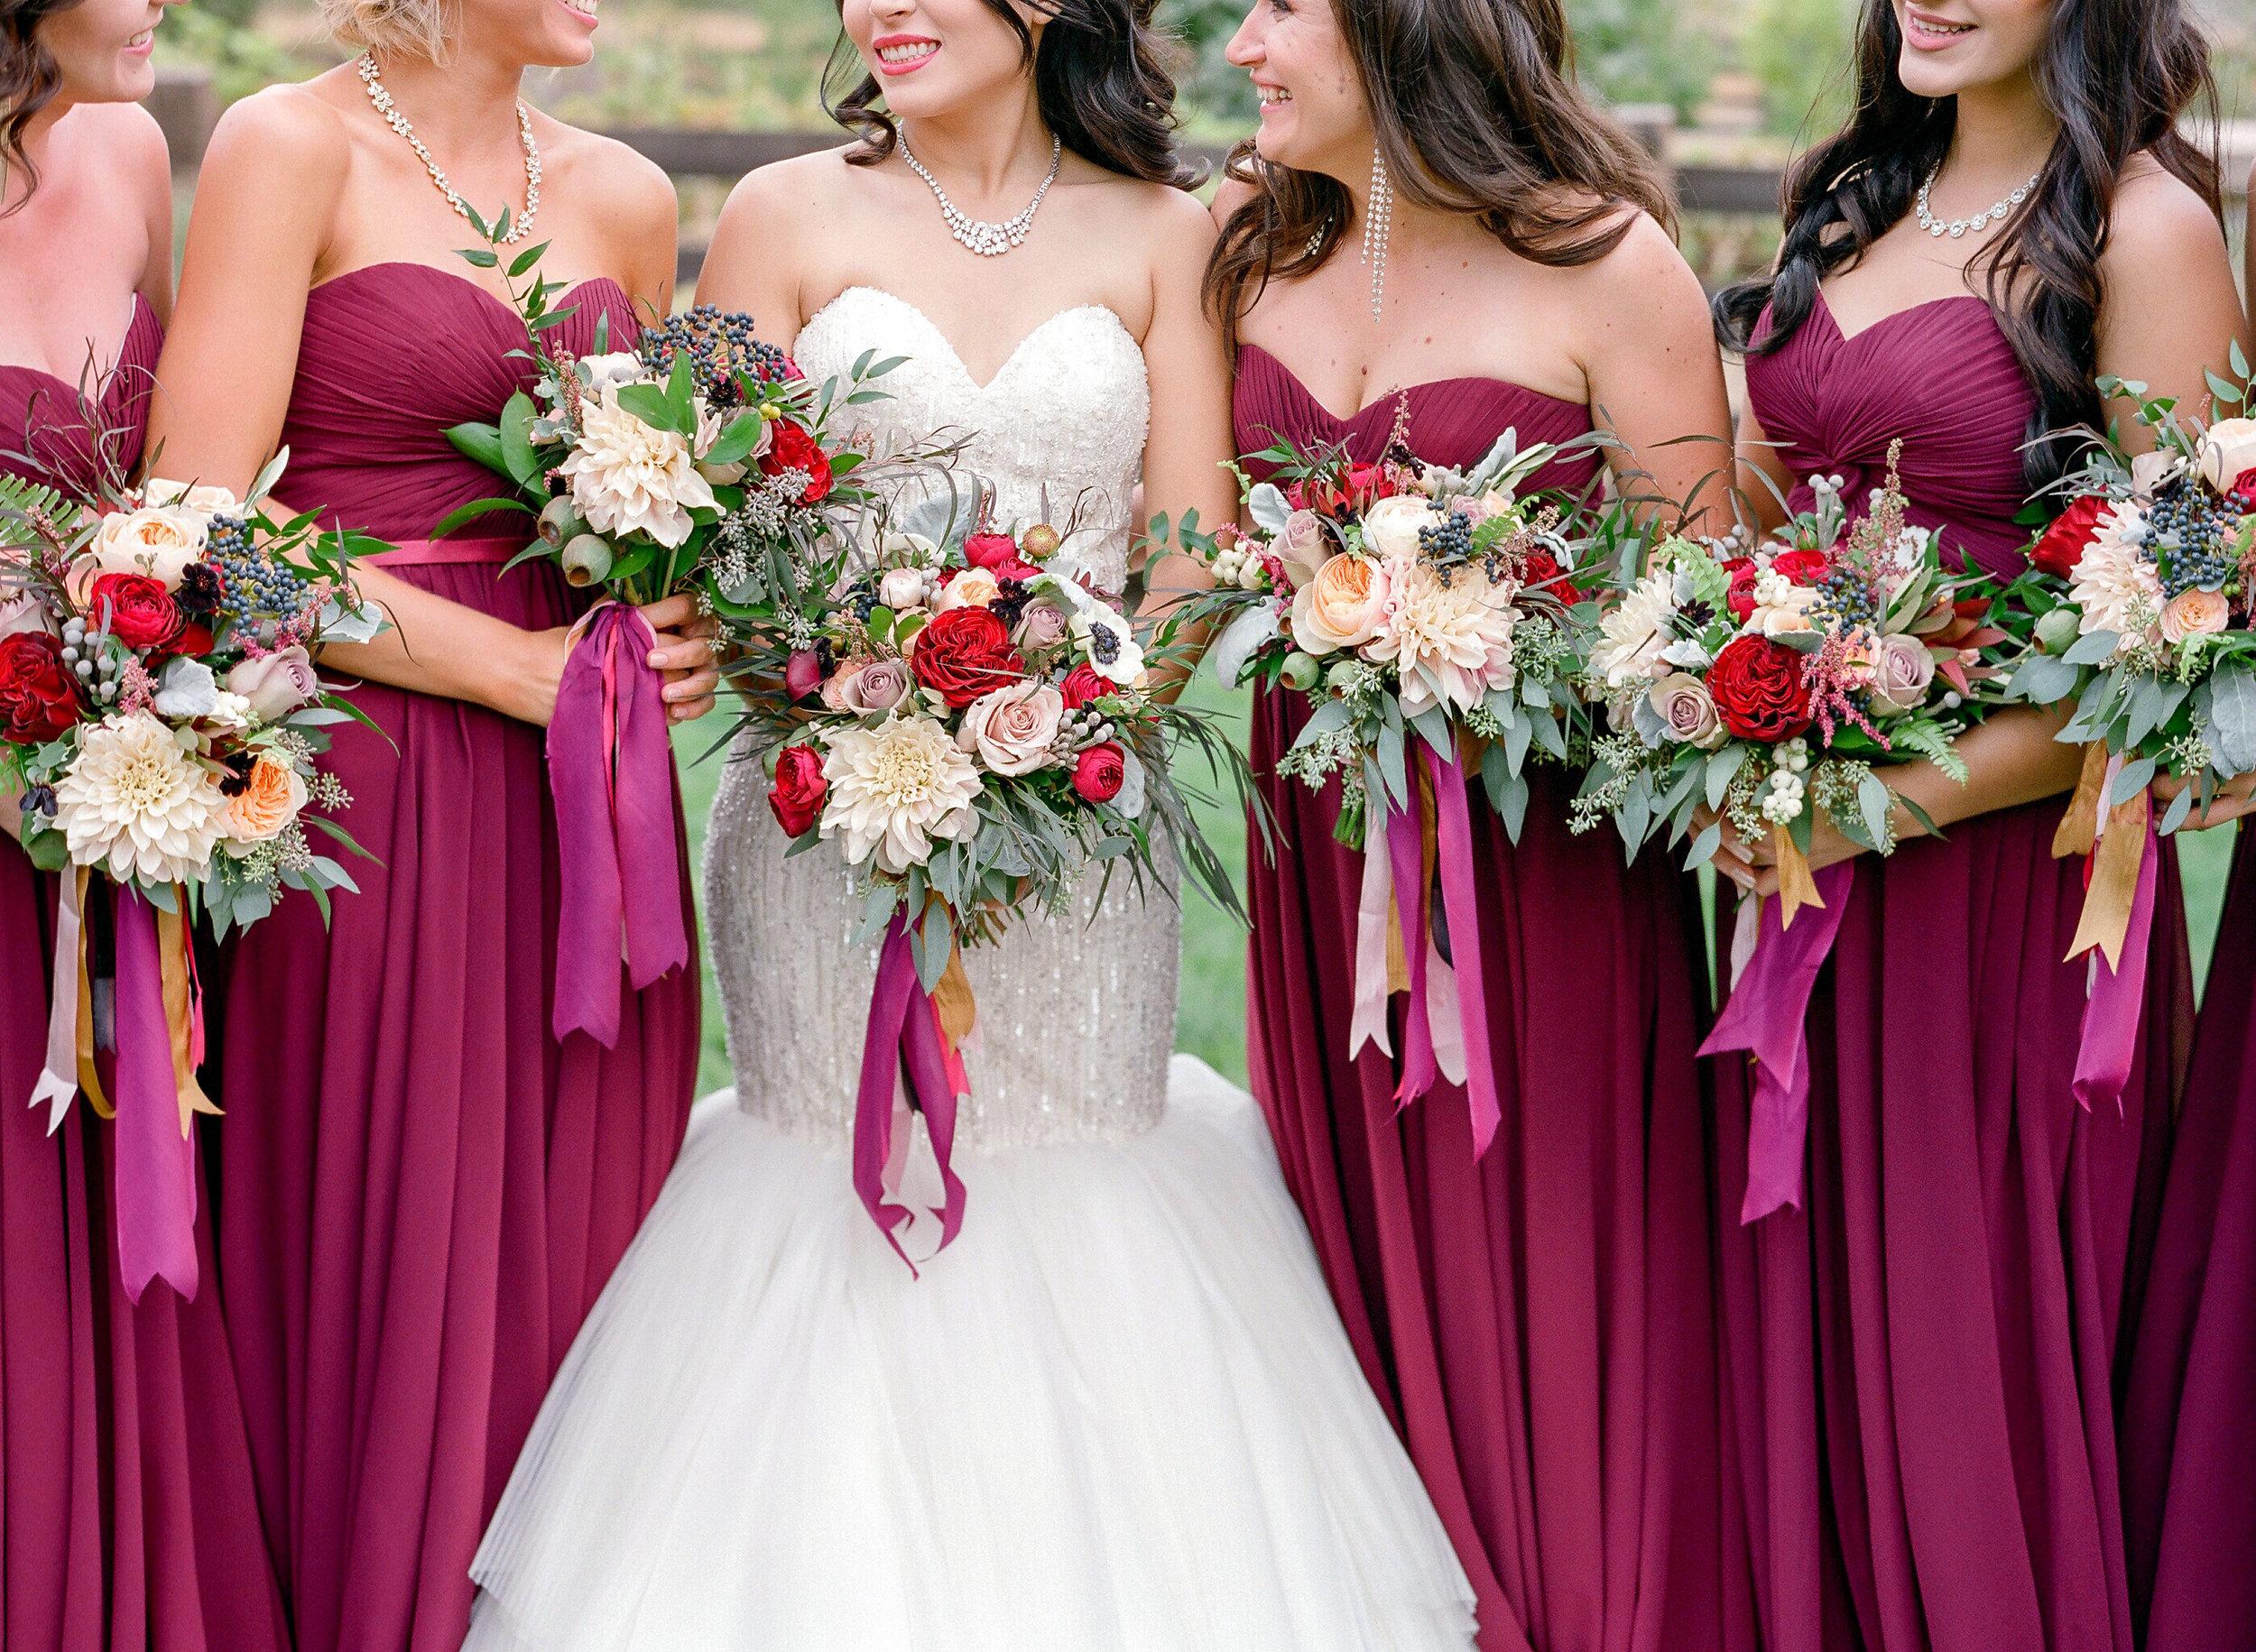 Amador_County_Wedding_Bride_Bridesmaids_Bouquets_Red_Burgundy_Gold_Rancho_Victoria_Vineyard_Northern_California.jpg